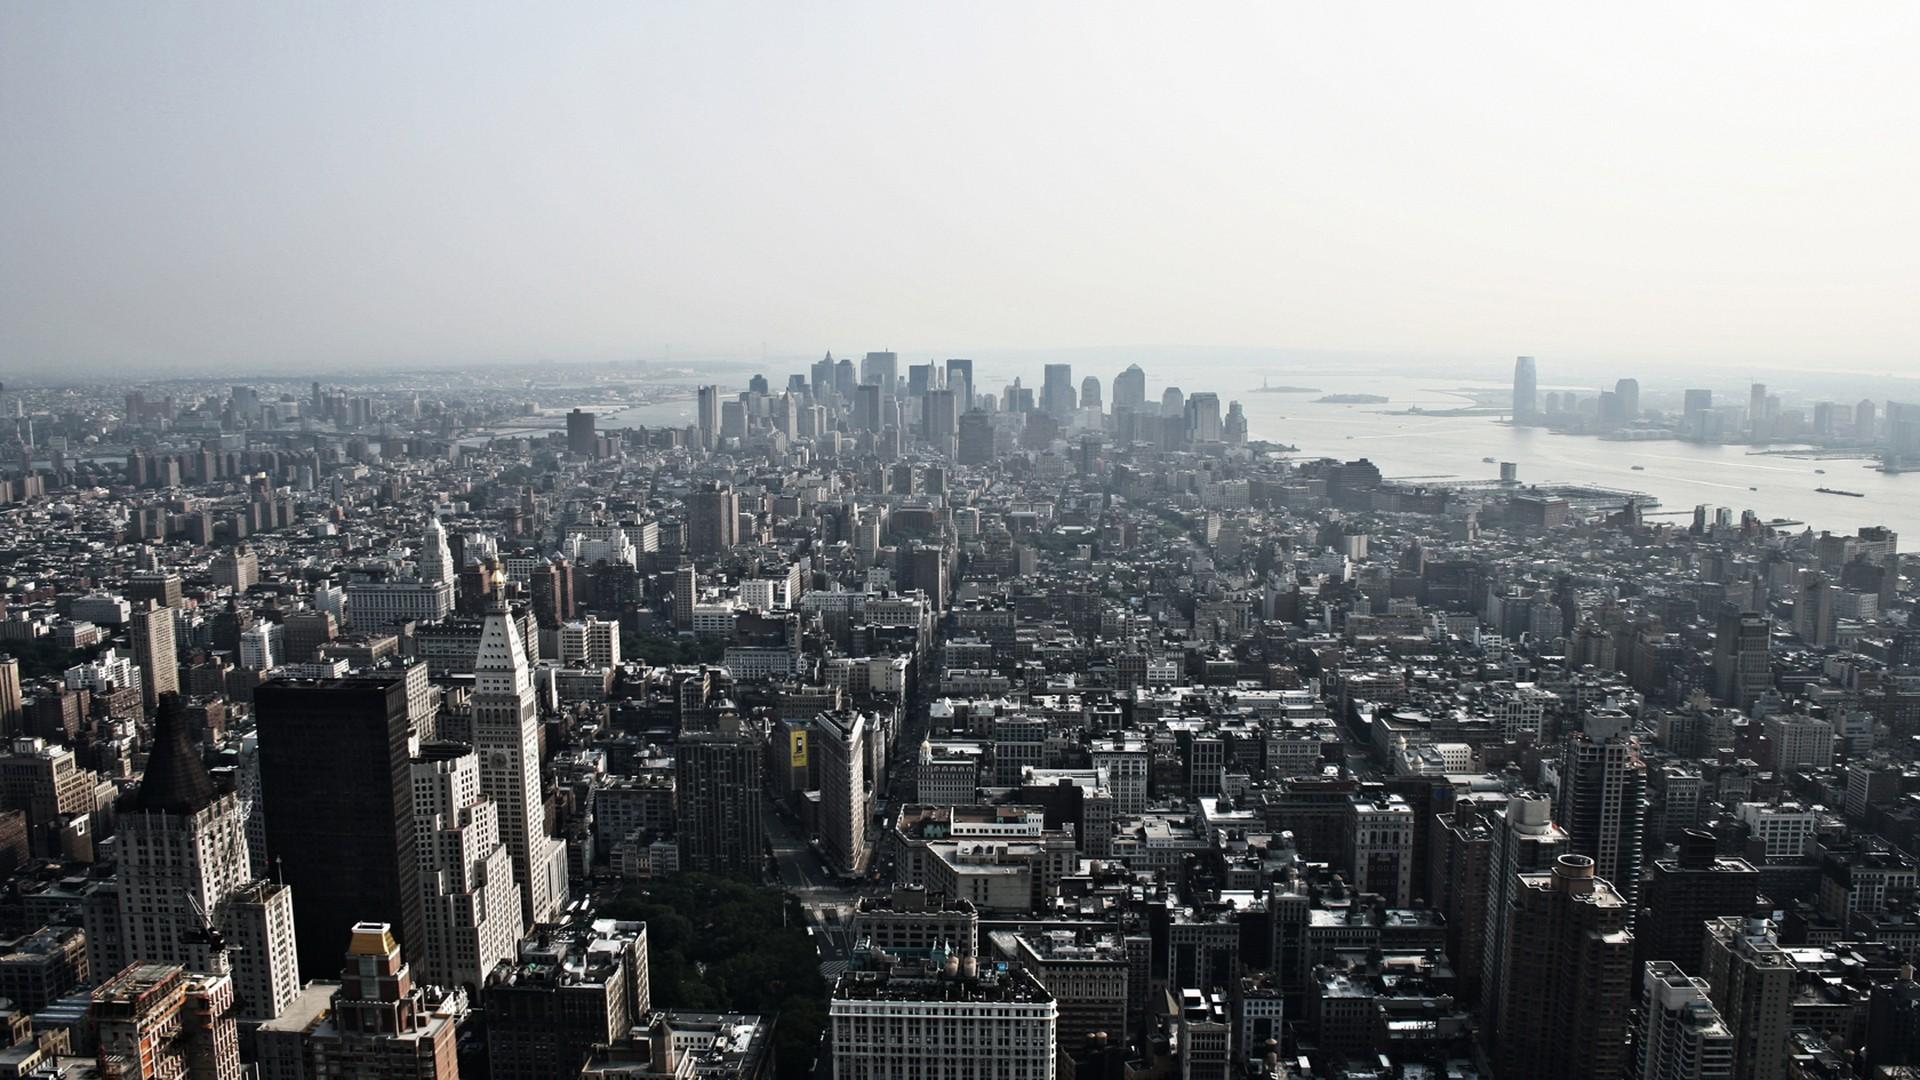 Fantastic City Skyline Wallpaper